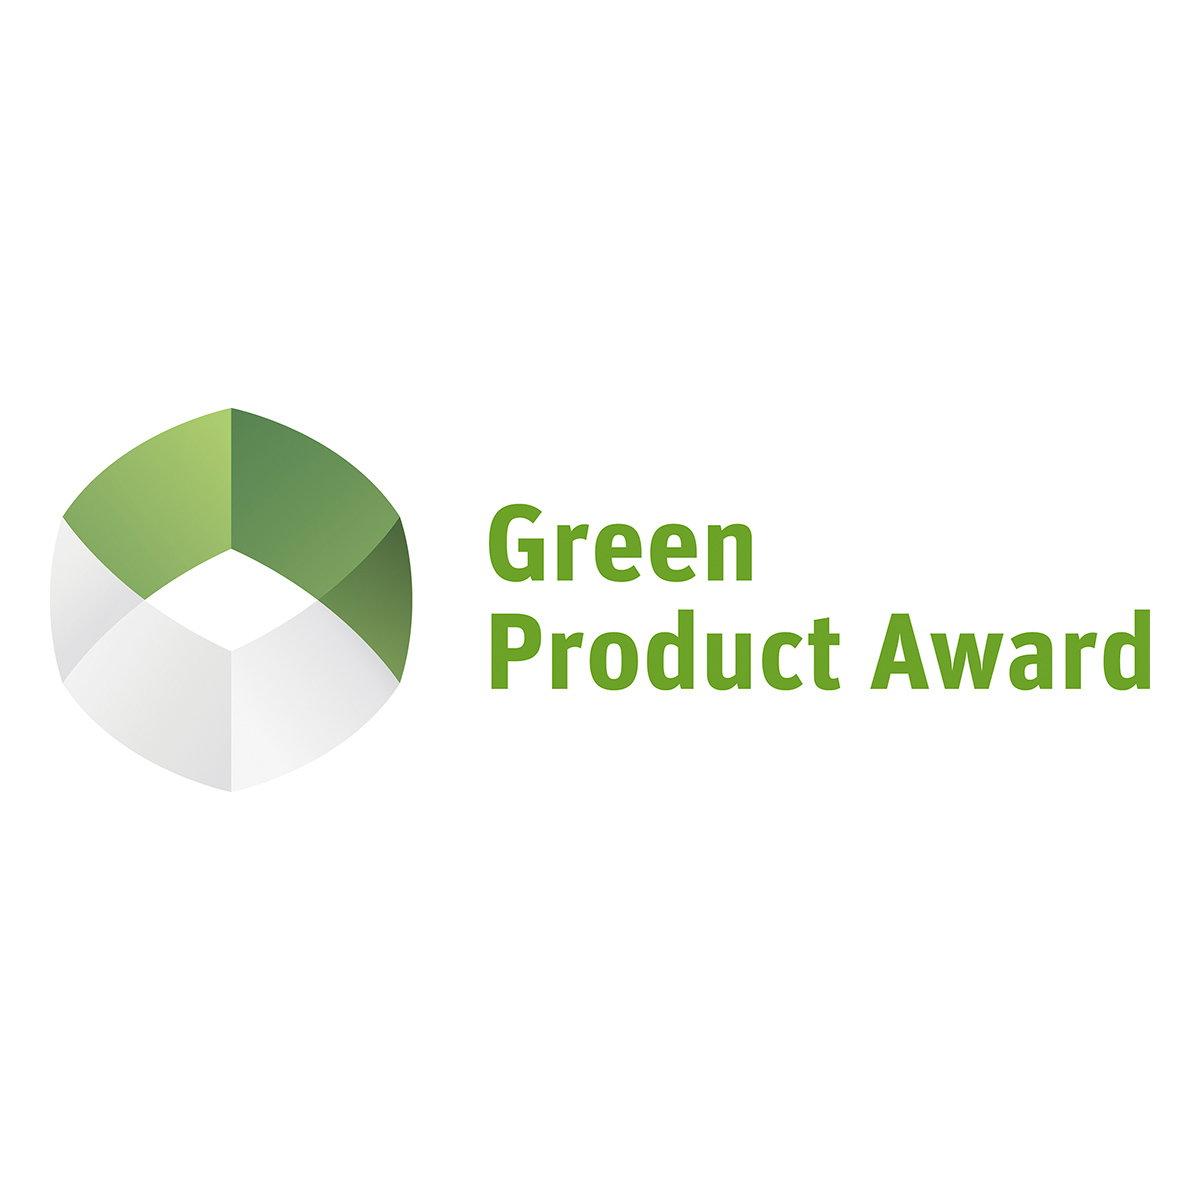 Green Product Award 2016